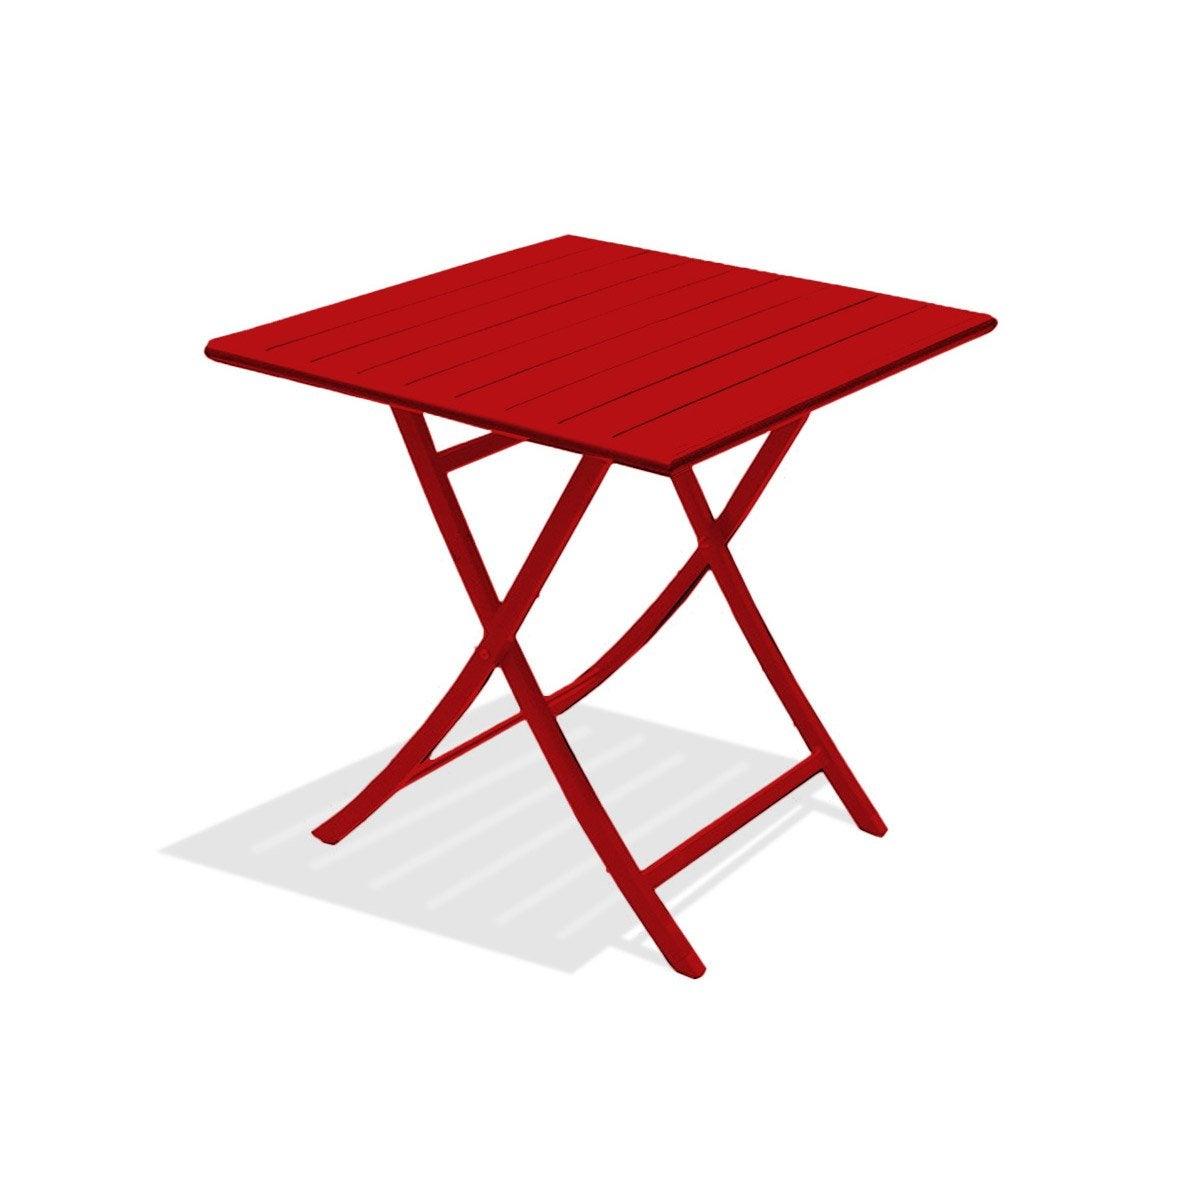 Table de jardin Marius carrée rouge carmin 2 personnes | Leroy Merlin